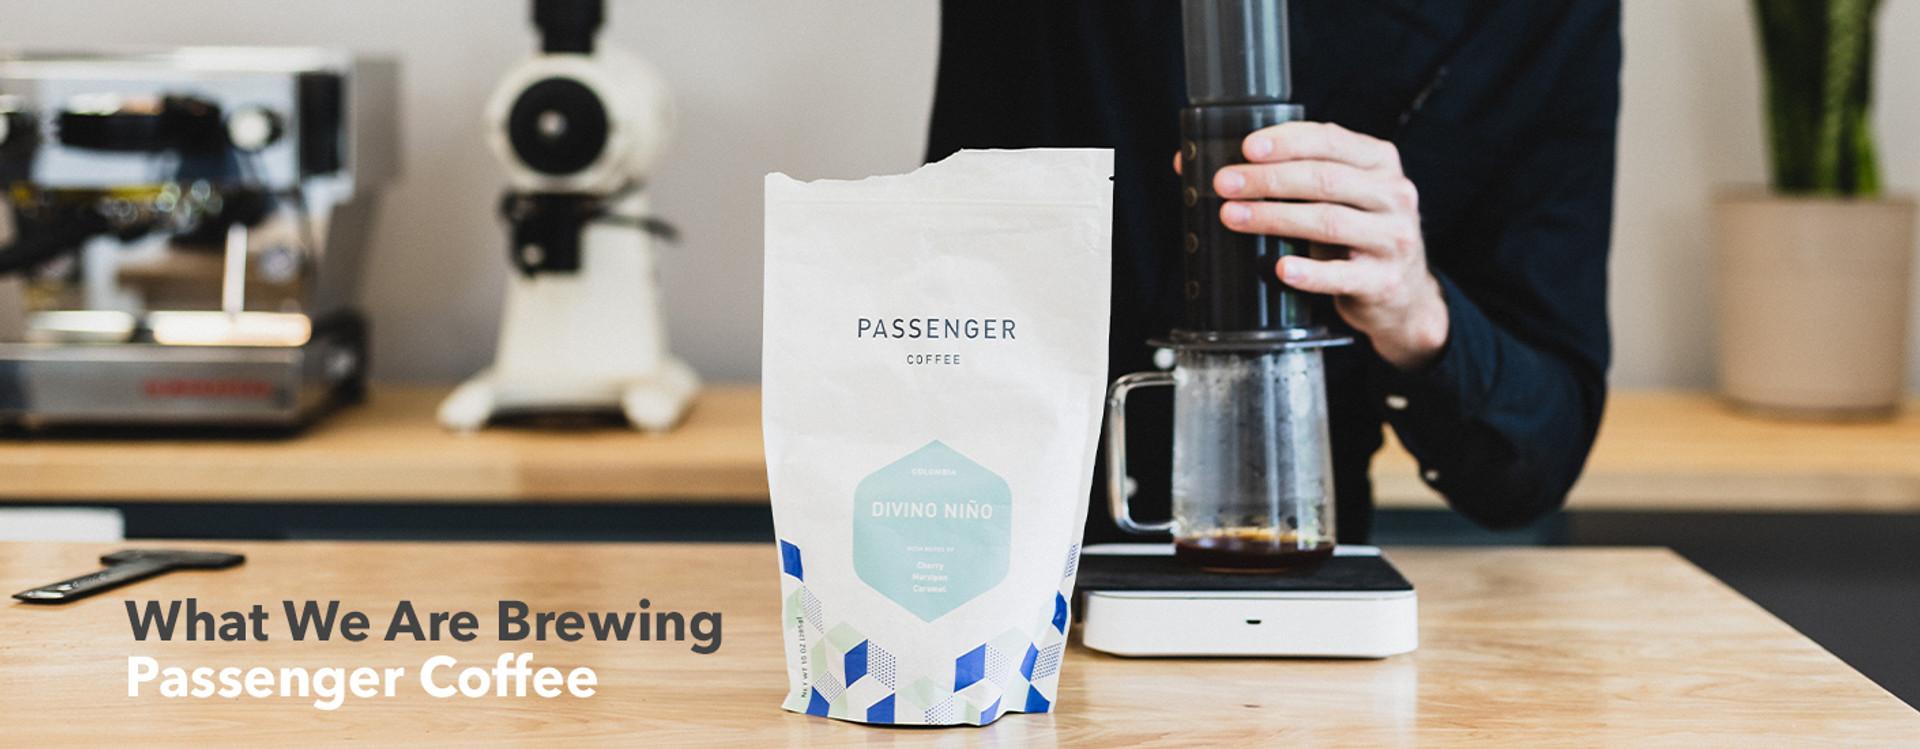 what we are brewing, passenger coffee, on aeropress, divino niño